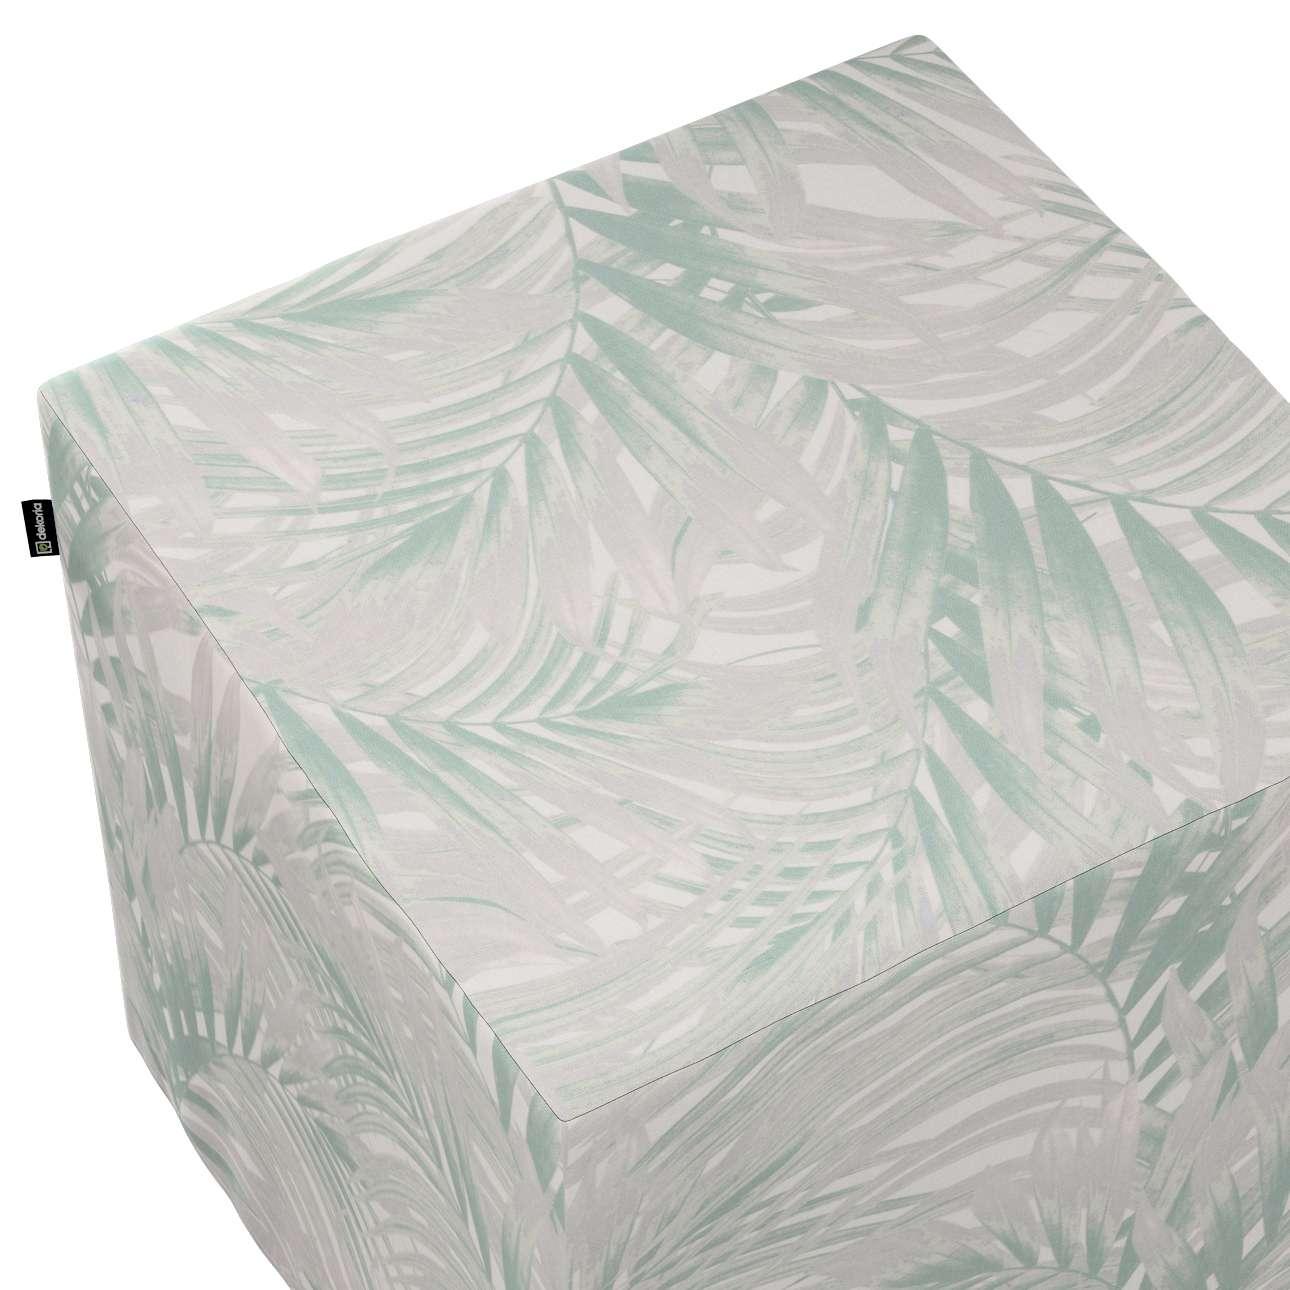 Betræk til siddepuf fra kollektionen Gardenia, Stof: 142-15